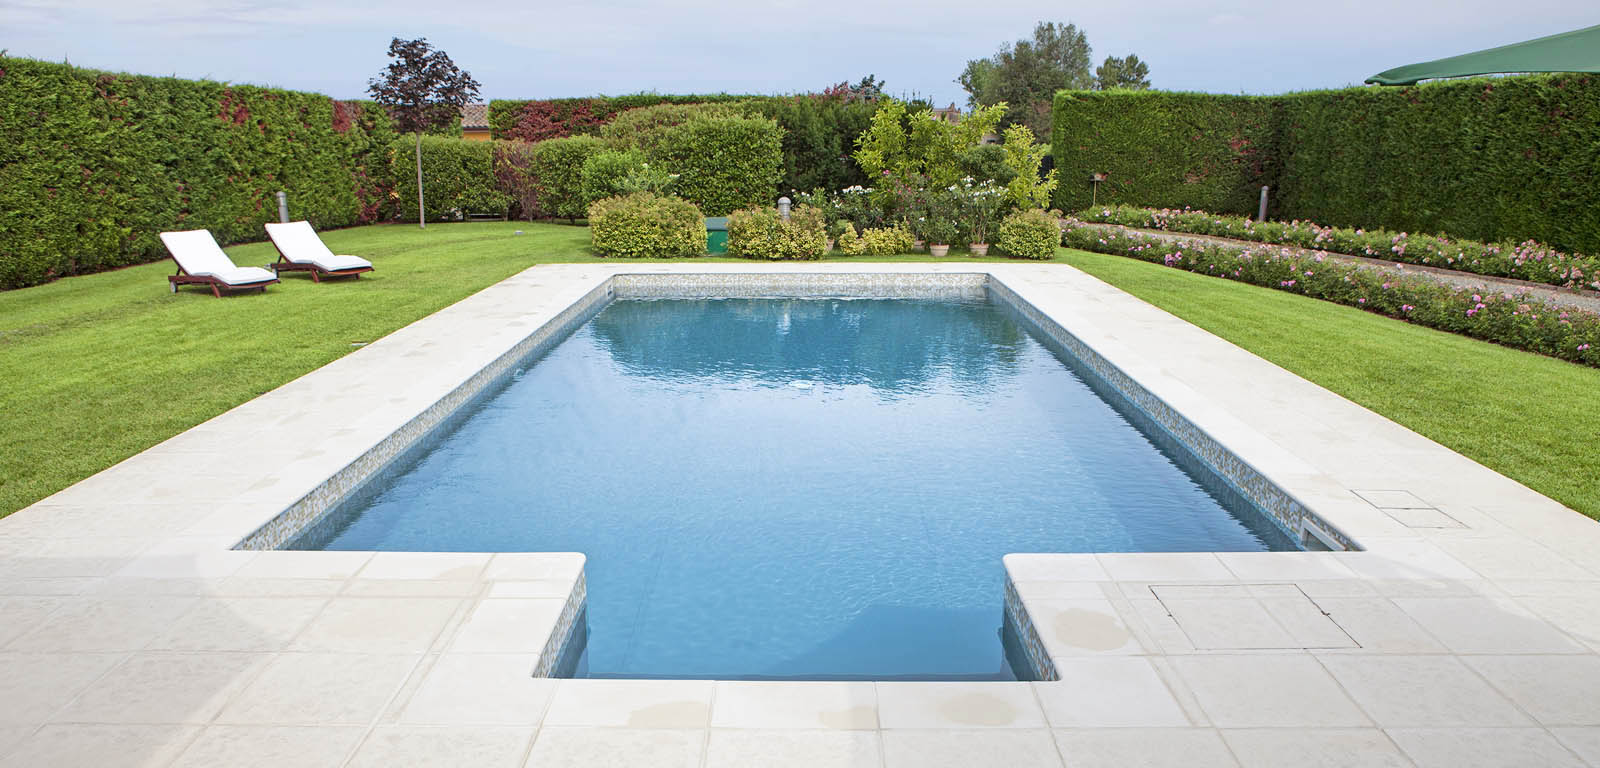 Piscine luxury la piscina esclusiva di lusso piscine - Foto di piscine interrate ...